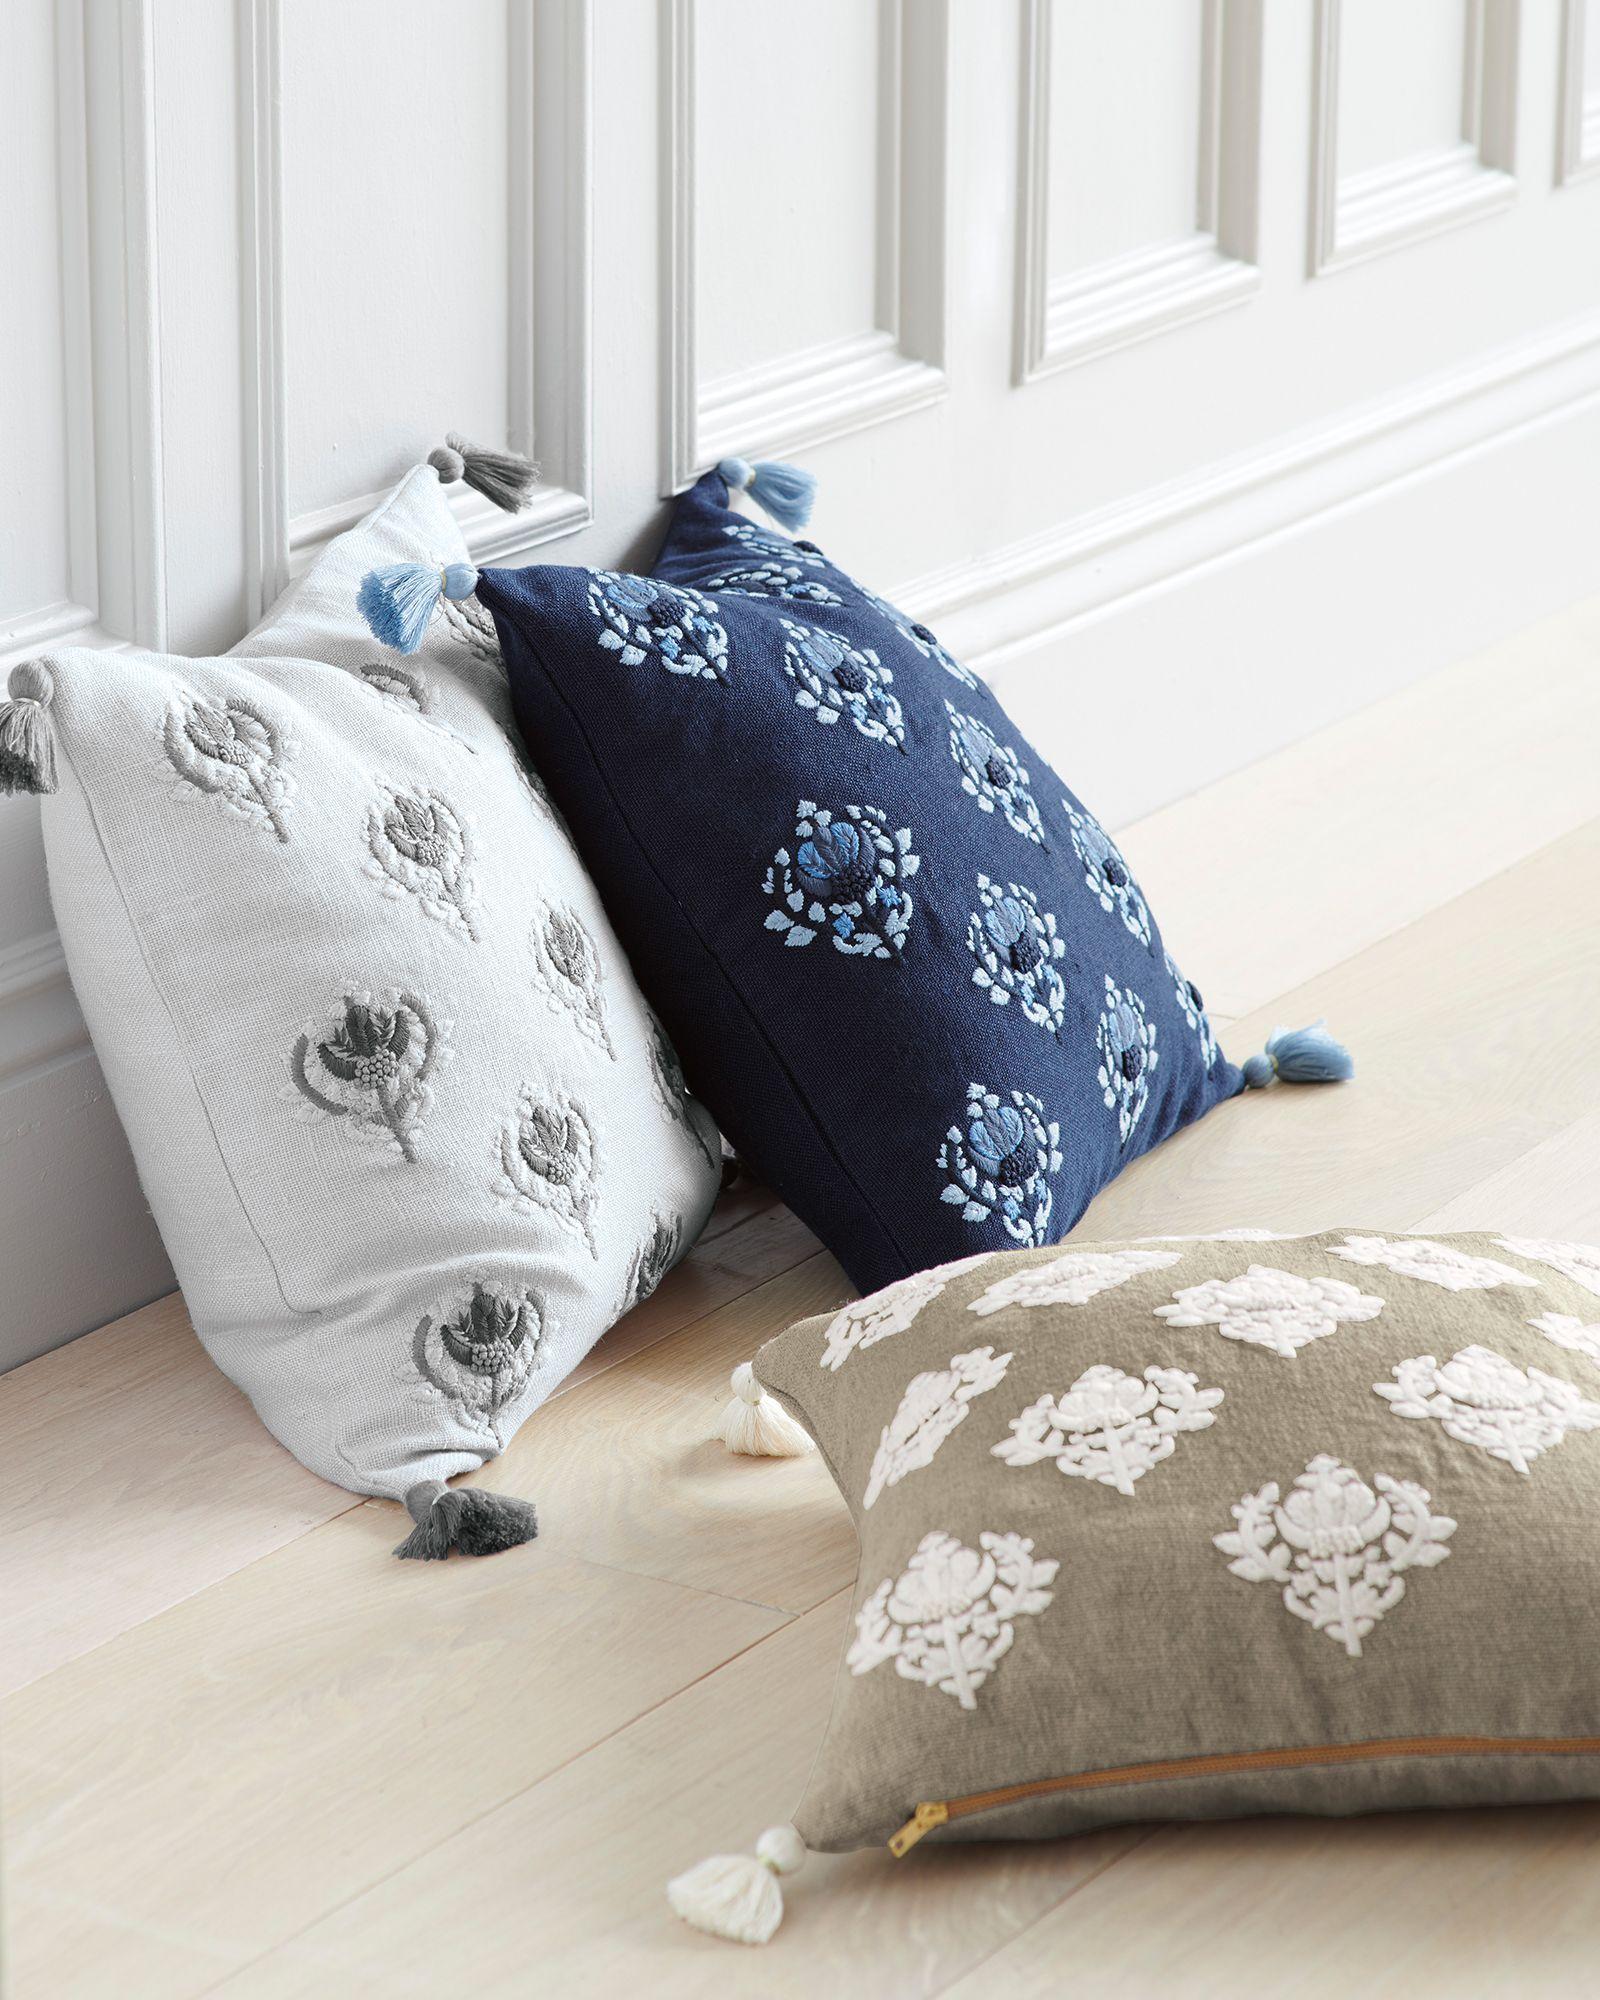 Kemp Pillow Cover Pillows Throw Pillow Styling Pillow Covers